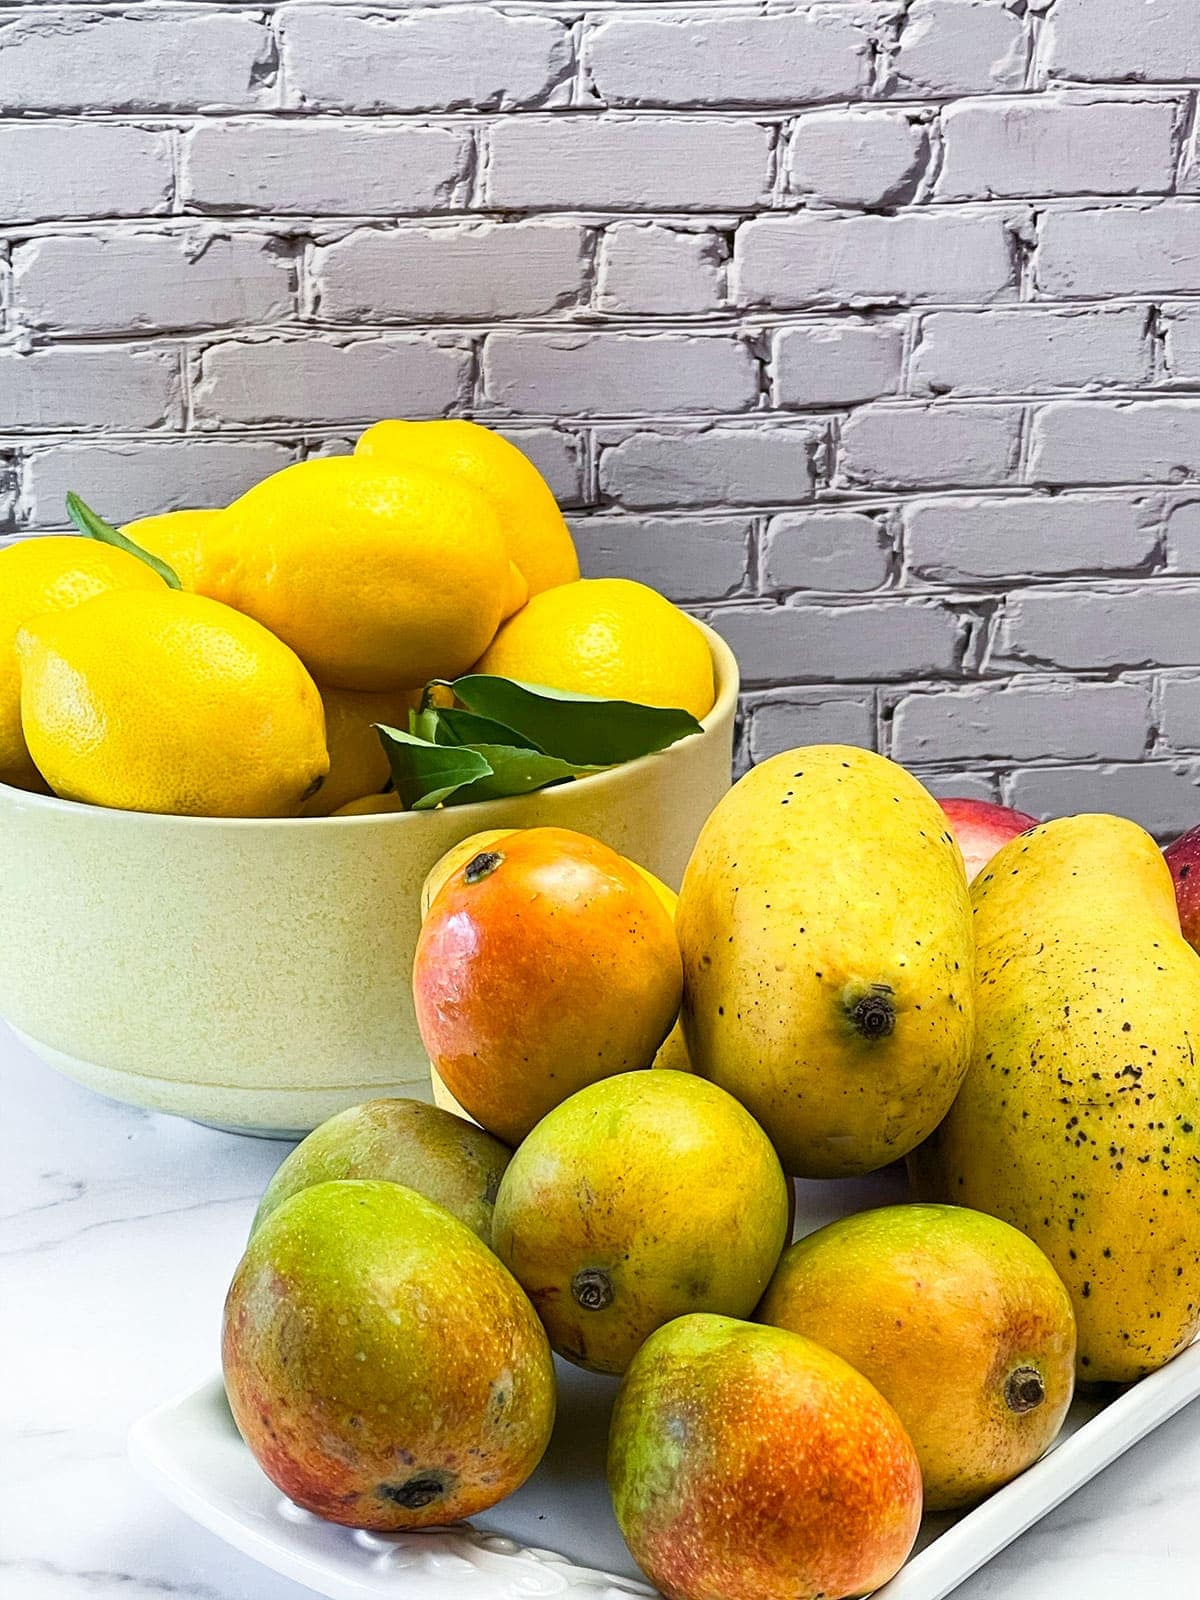 Mango lemonade ingredient, lemonade in a yellow bowl and mangoes on a white platter